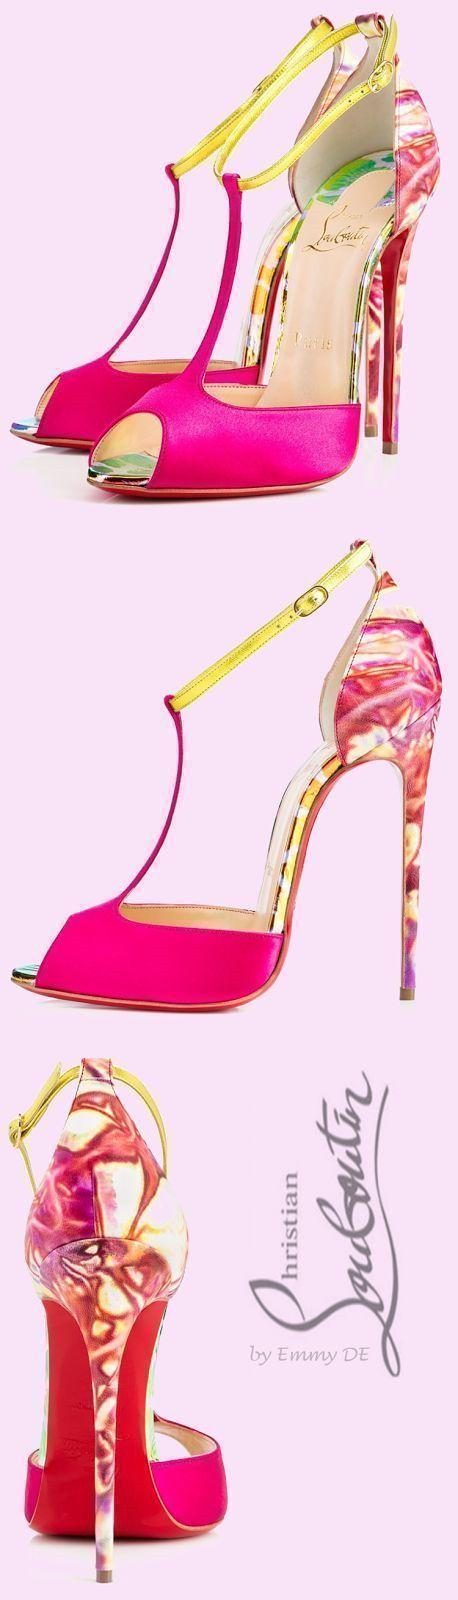 christina louboutin,women #shoes,cheap christina louboutin,discount christina louboutin,fashion christina louboutin,wedding #shoes, bridal #shoes, luxury shoes,high heels,christina louboutin heels,beautiful high heels,christmas gifts,christmas,christmas guirlanda,christmas presentes,high heels pumps,high heels boots,high heels sandals,high heels sandals platform,high heels shoes,high heels shoes black,brown,women high heels,high heels for teens #highheelsforteens…